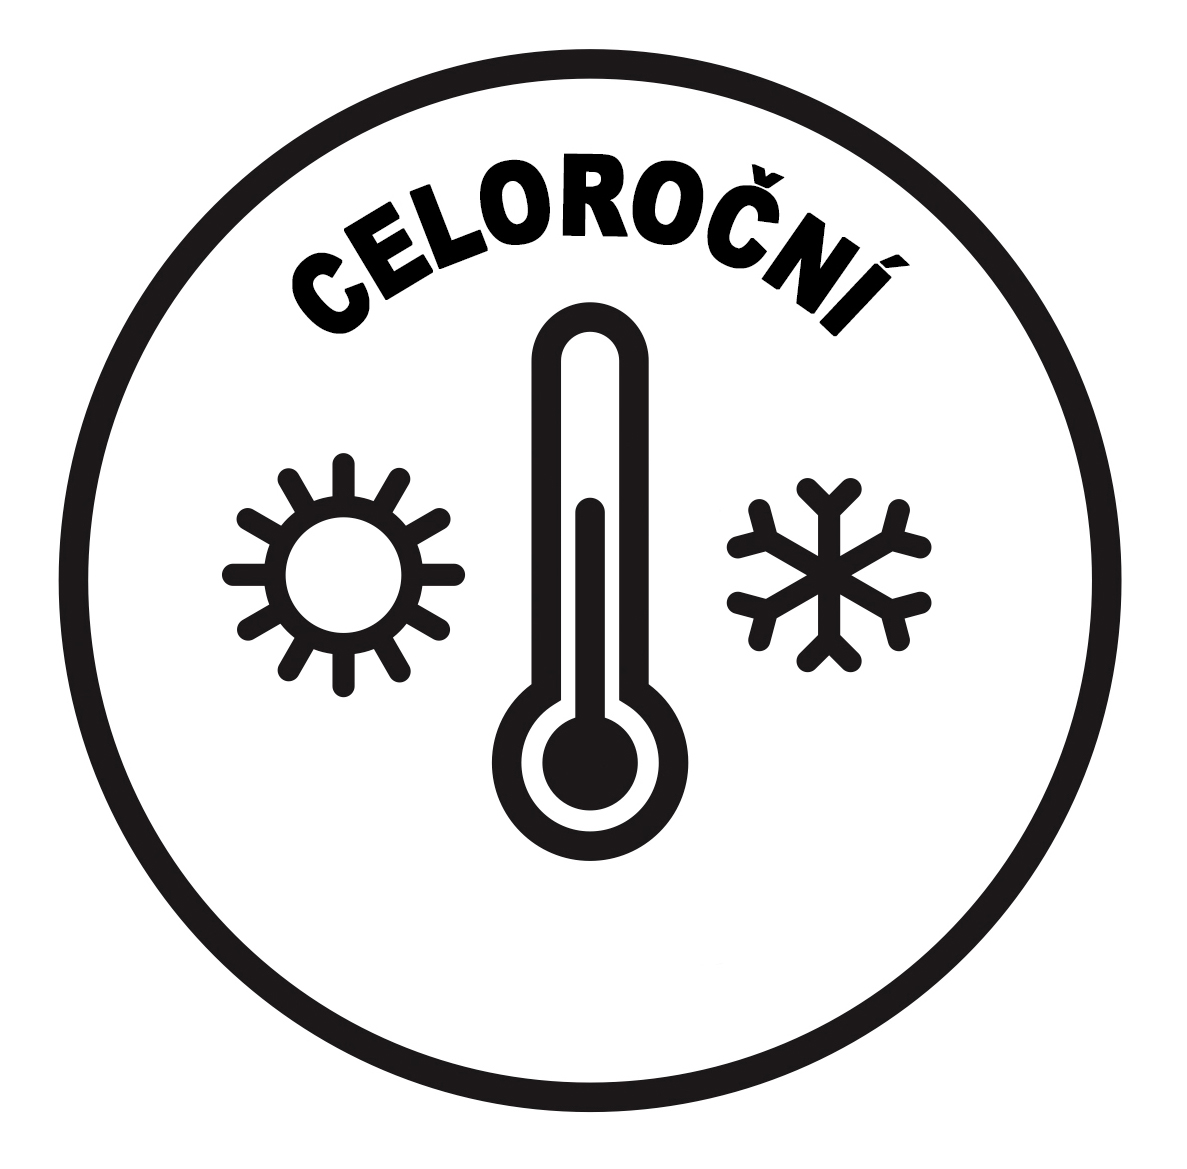 ikona_CELOROCNI_CR